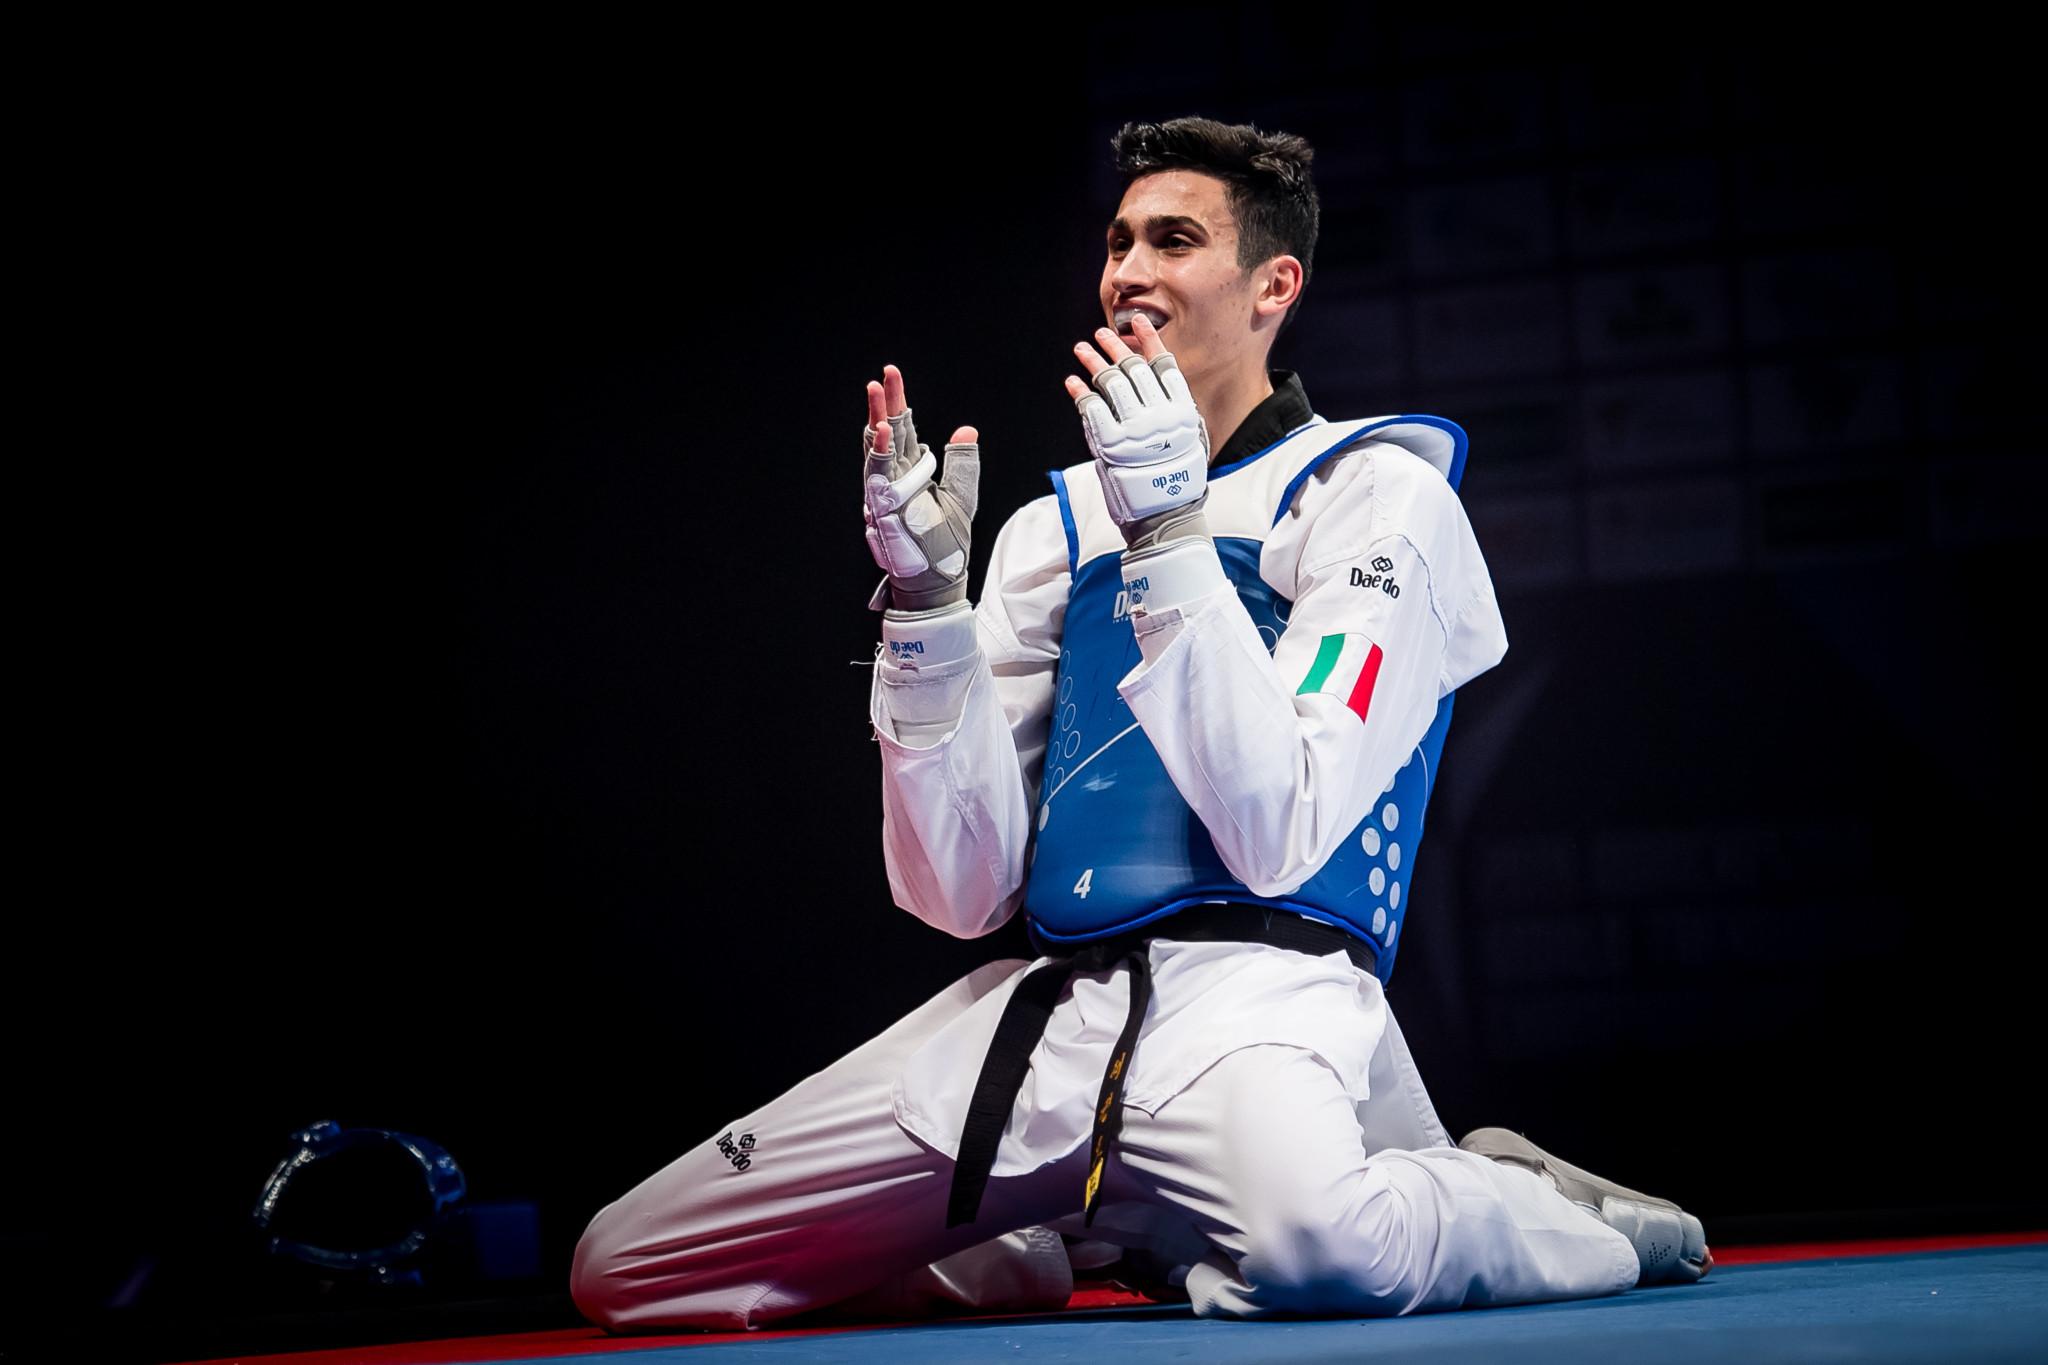 Simone Alessio claimed the men's under-74kg title at the 2019 World Taekwondo Championships in Manchester ©World Taekwondo